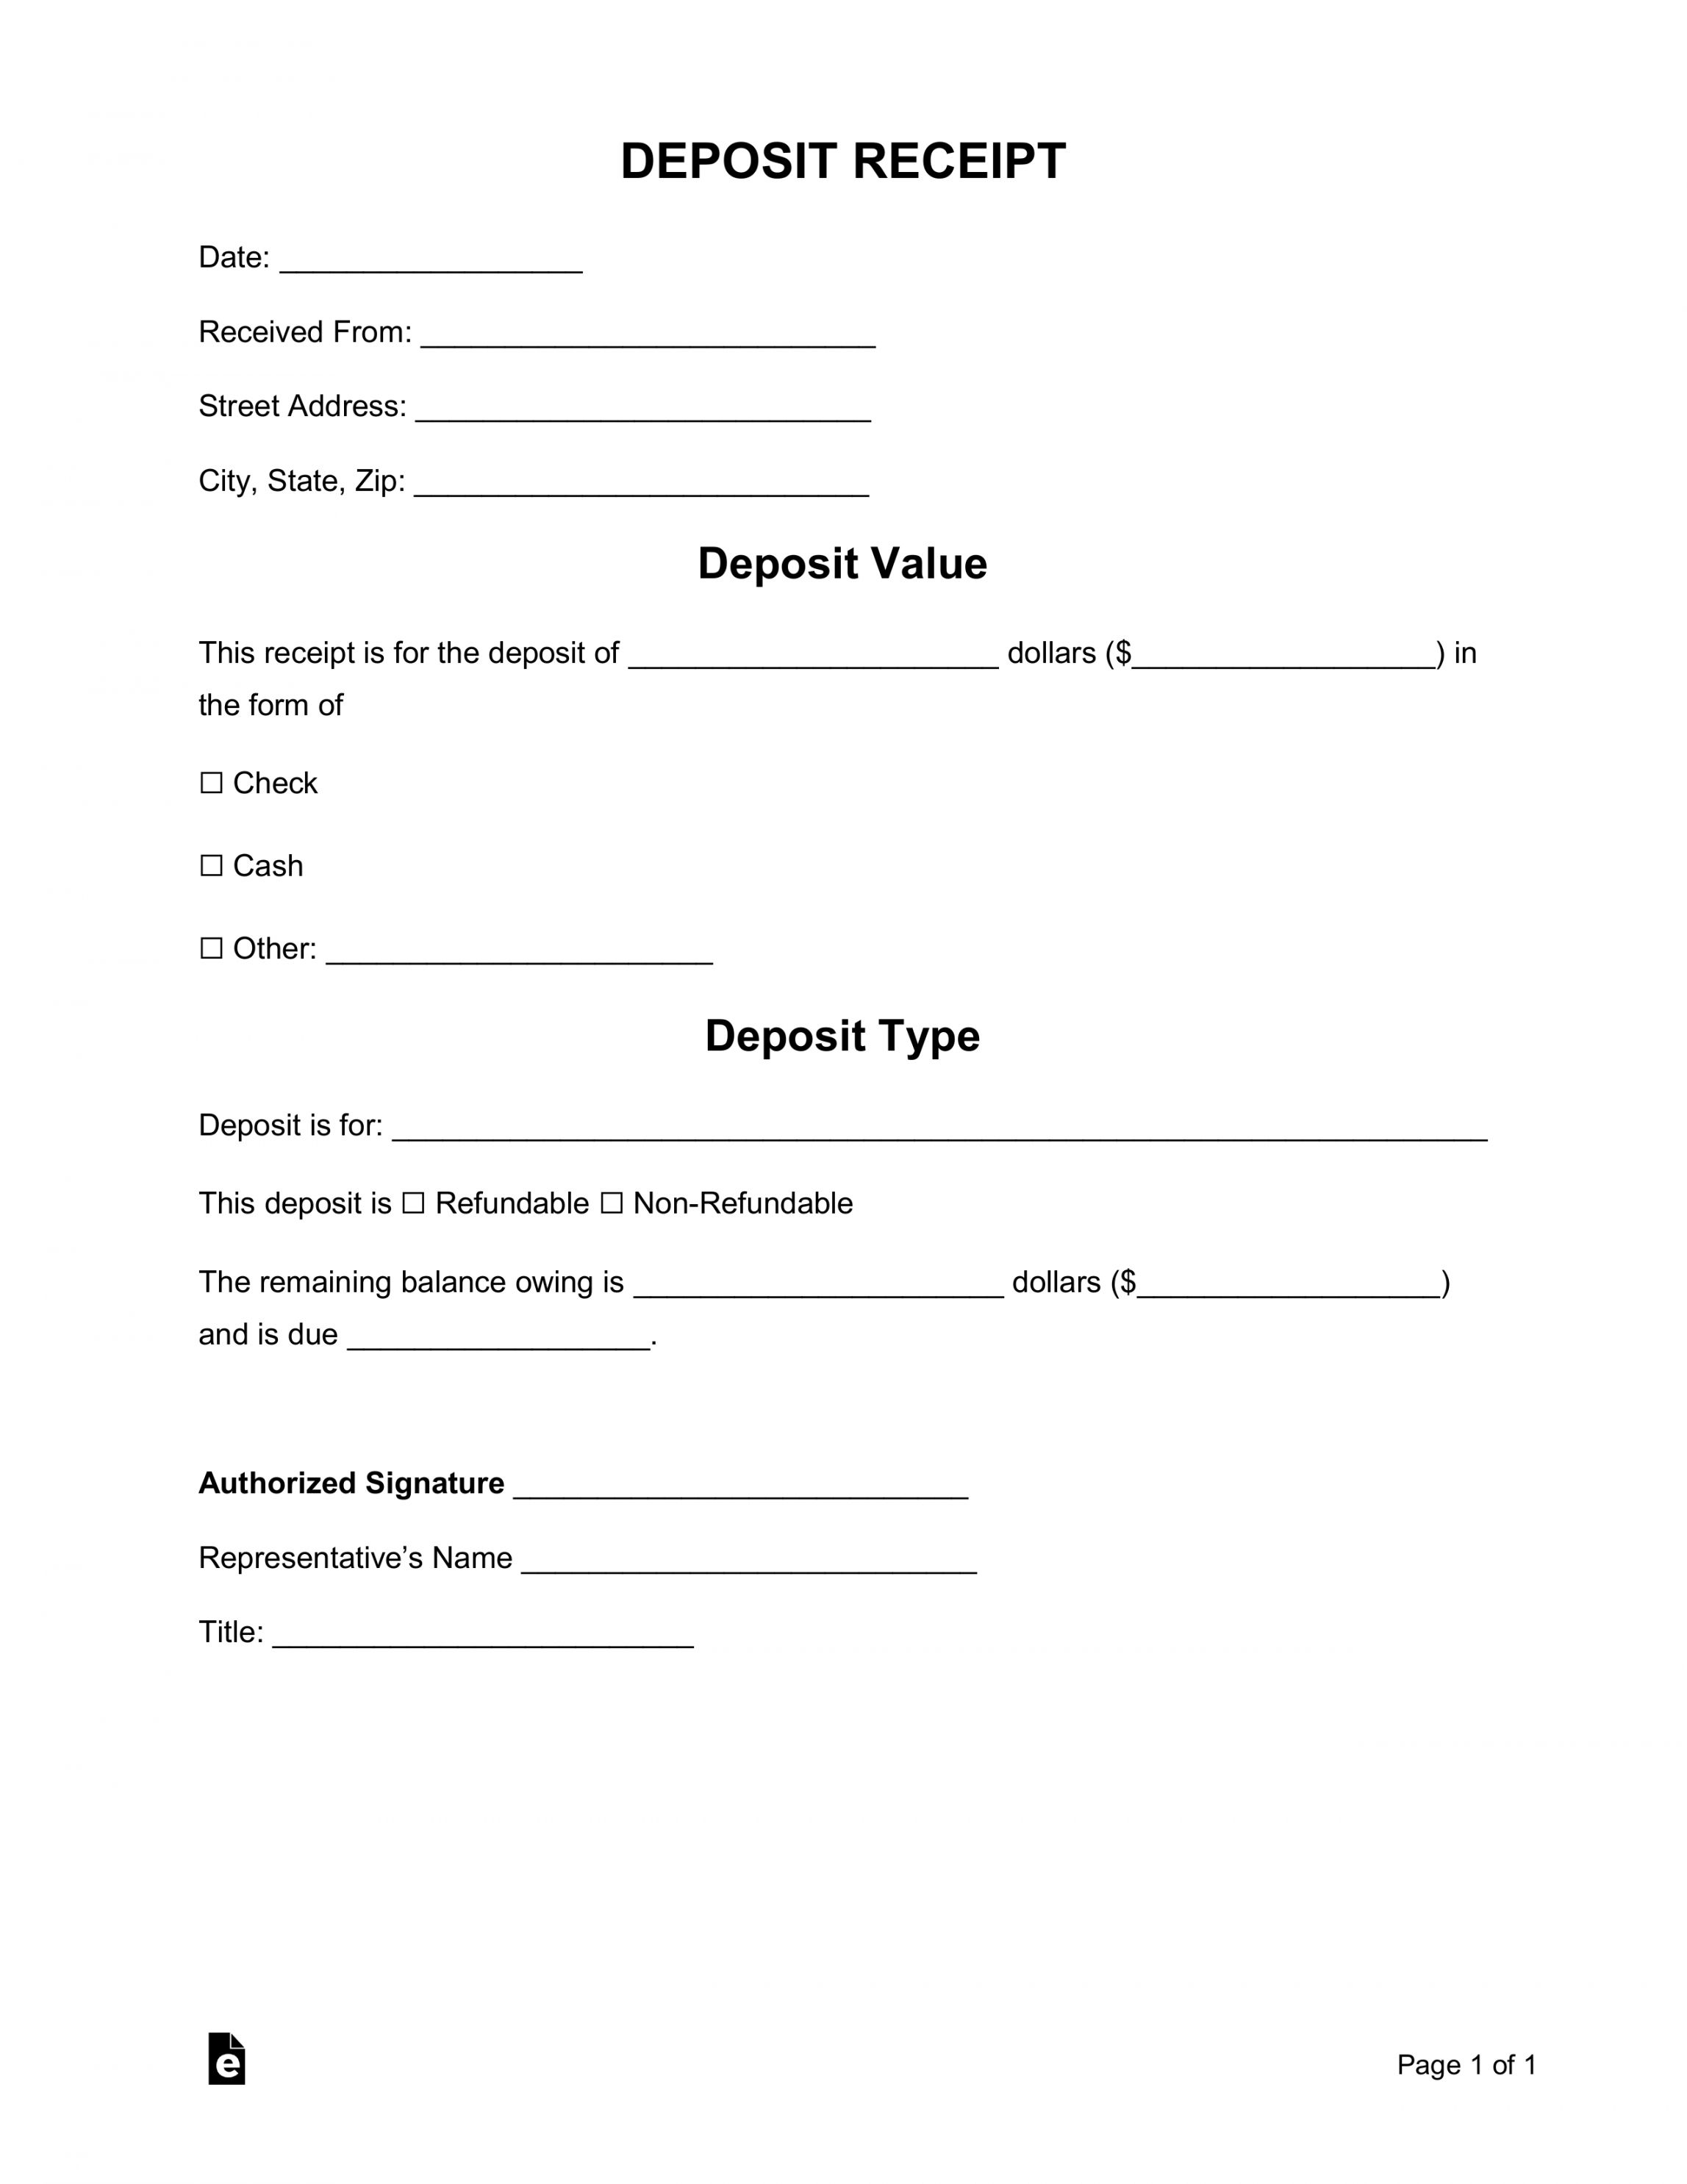 rental deposit receipt template in 2020 music teacher job description resume career objective for commerce student academic cv masters application